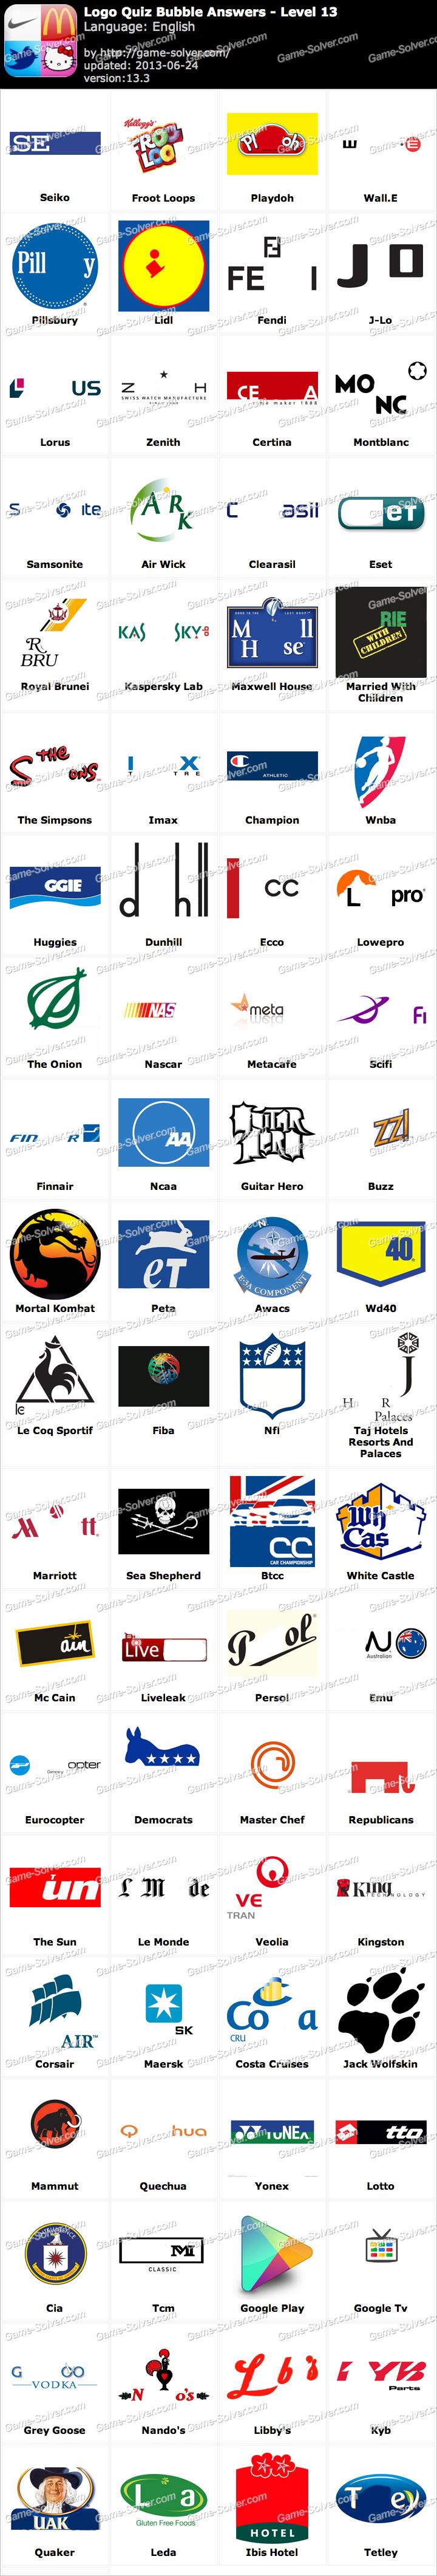 Logo Quiz By Bubble Answers Level 13 Logo Quiz Logo Quiz Answers Quiz